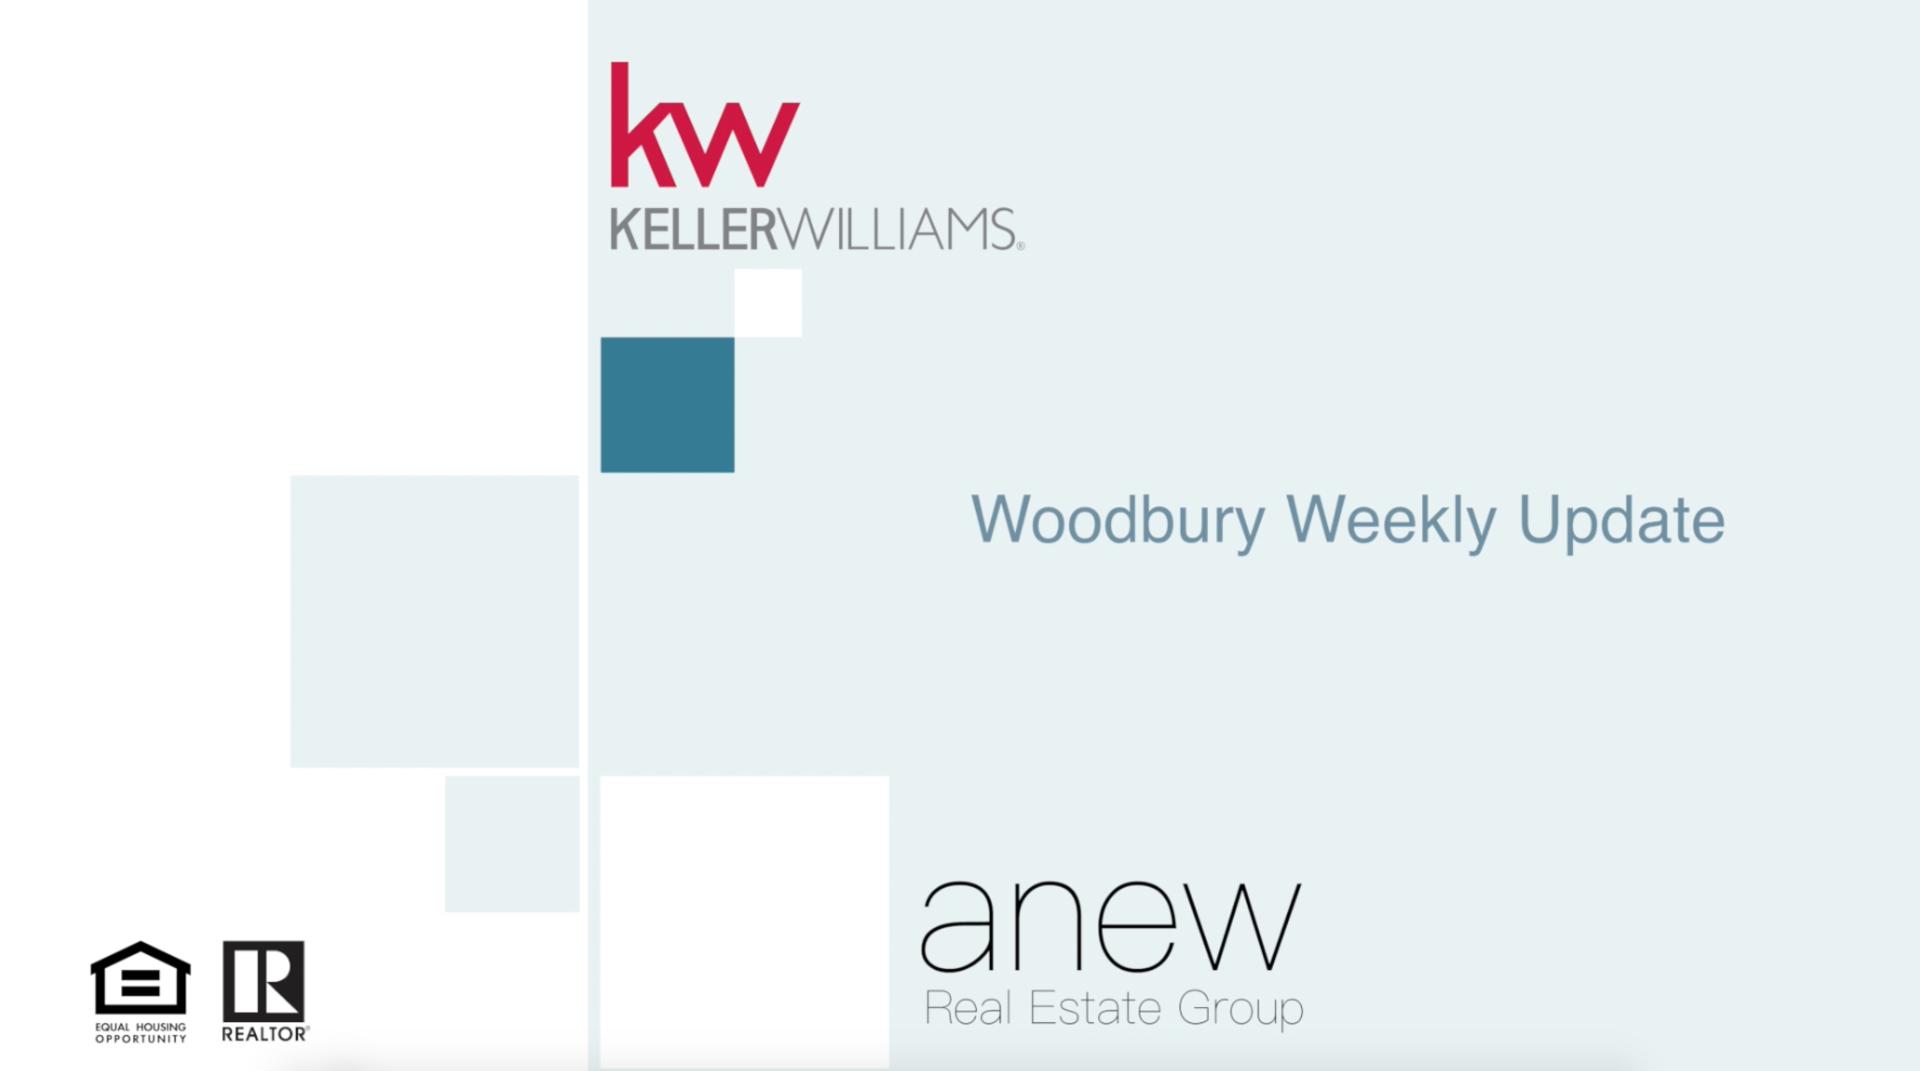 Woodbury Weekly Update for June 18th